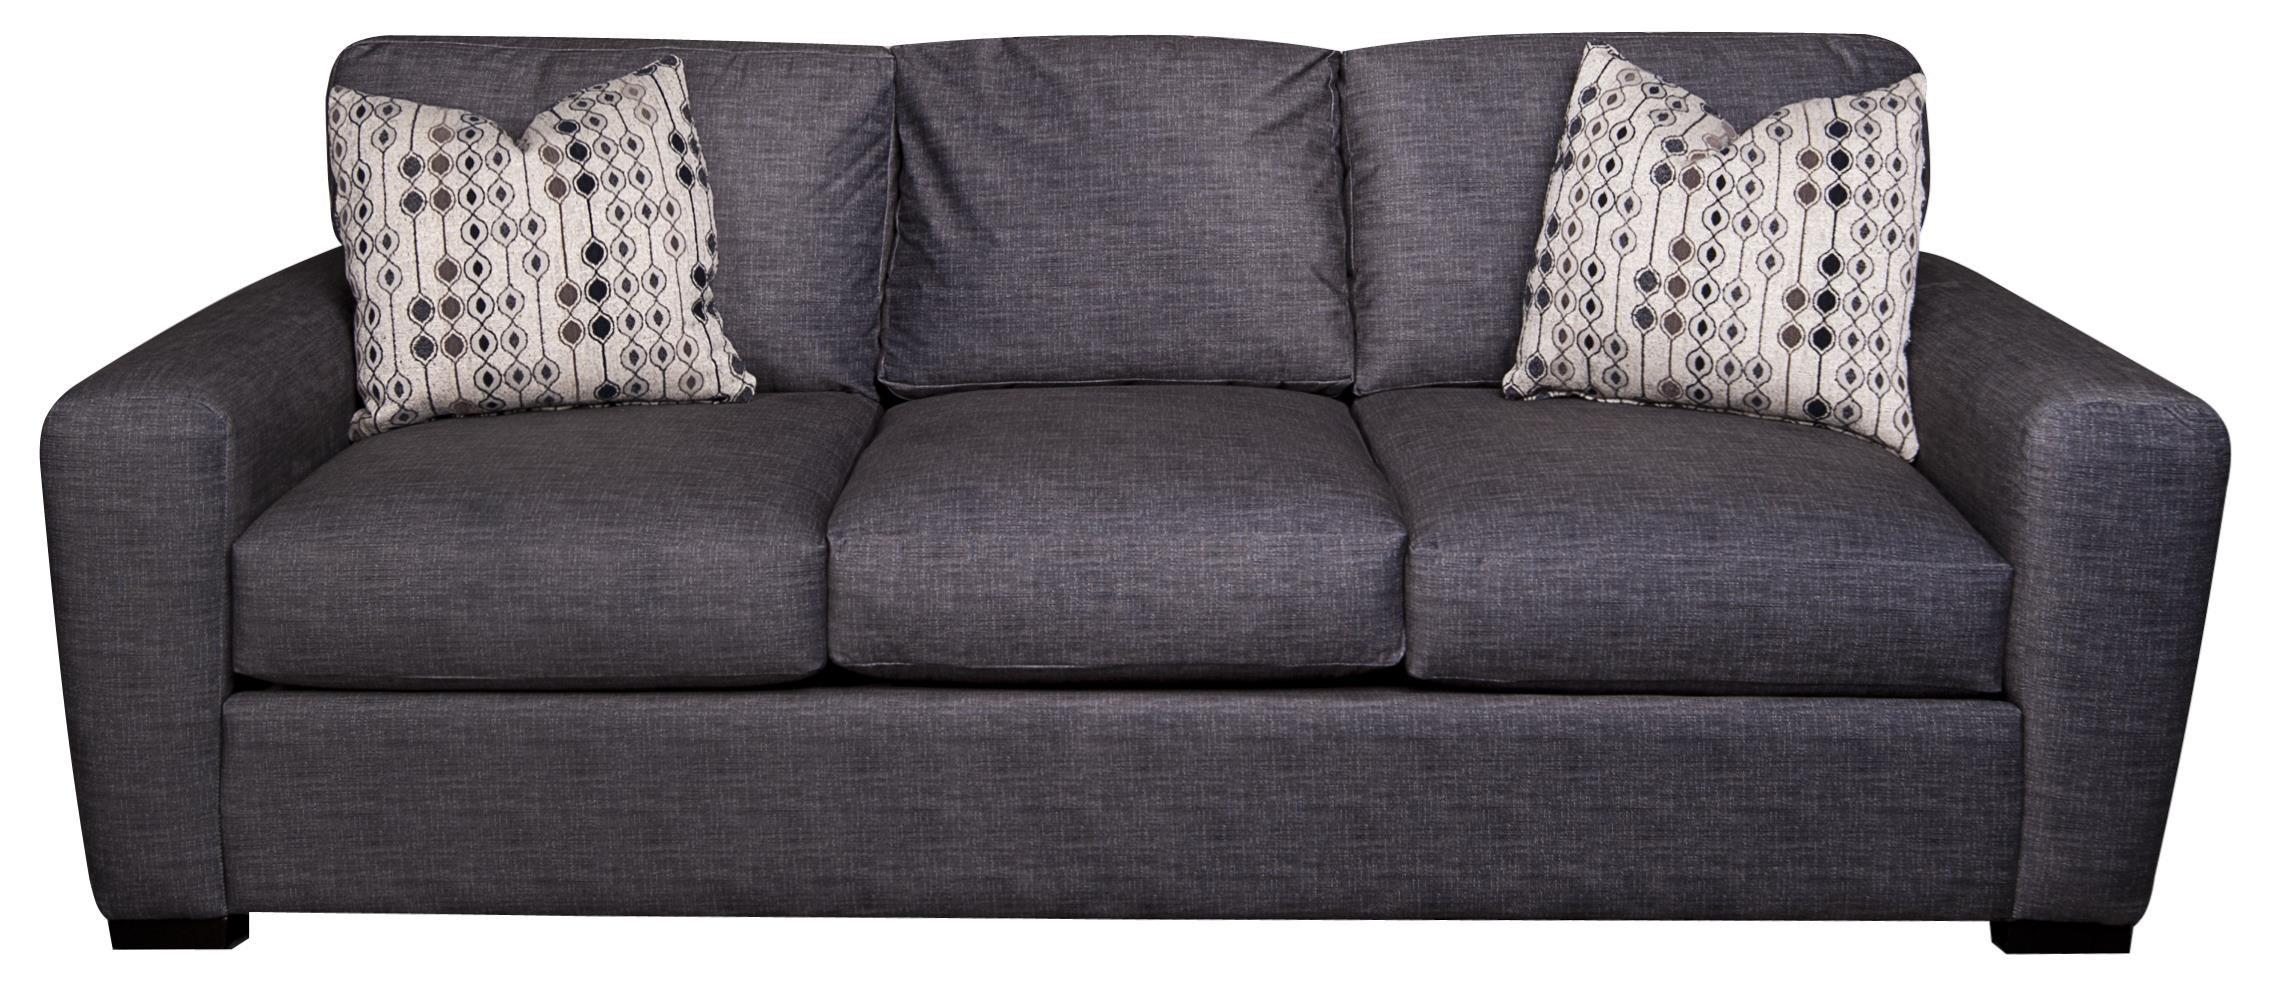 Morris Home Furnishings Beckham Beckham Sofa - Item Number: 778975298